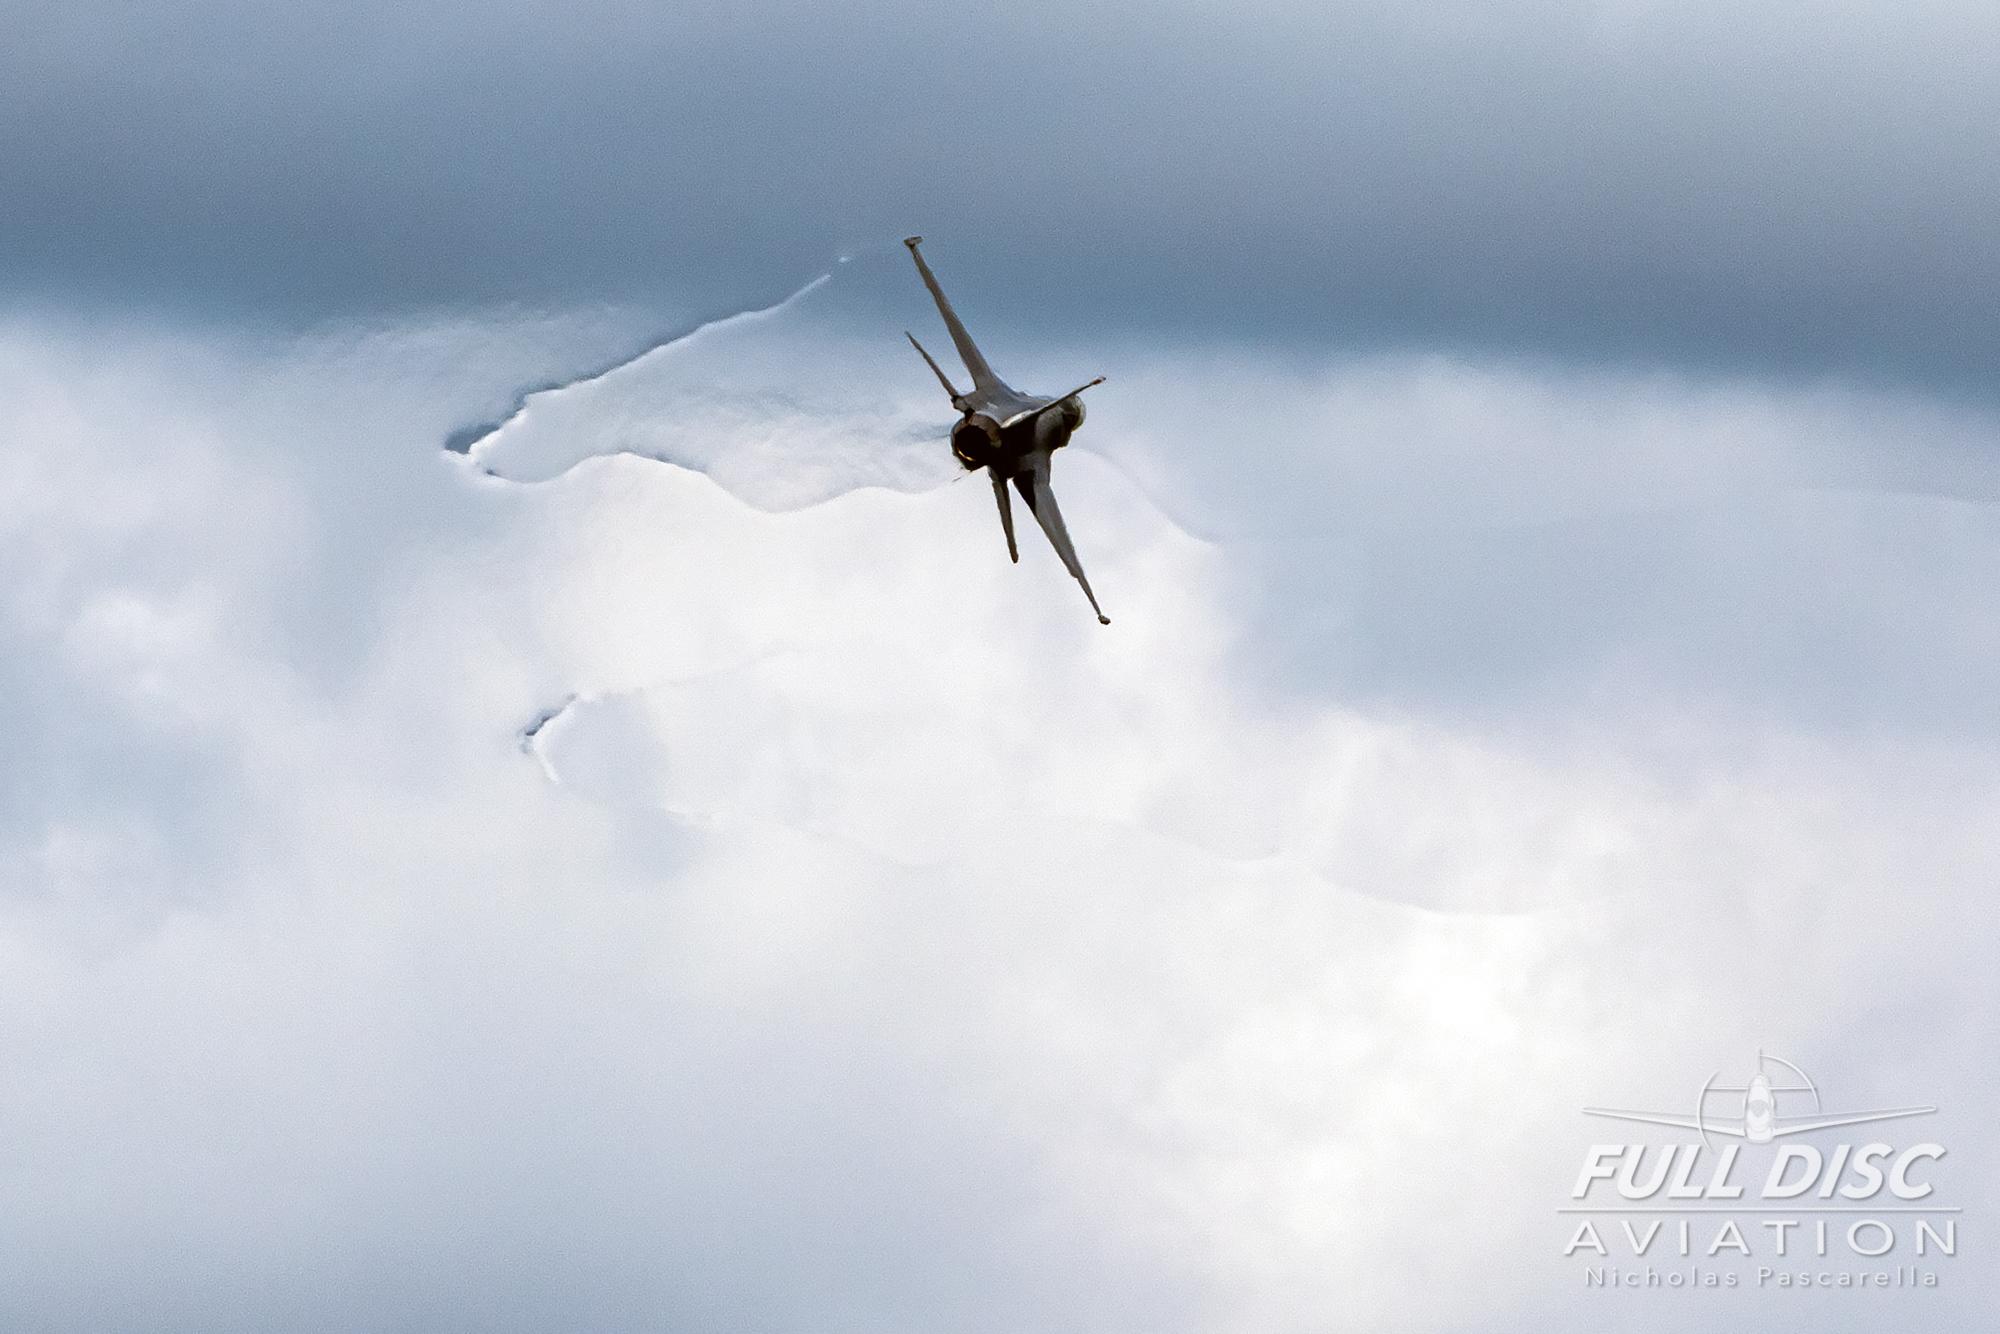 nickpascarella_fulldiscaviation_oceancityairshow_aviation_toro_f16_vortices.jpg